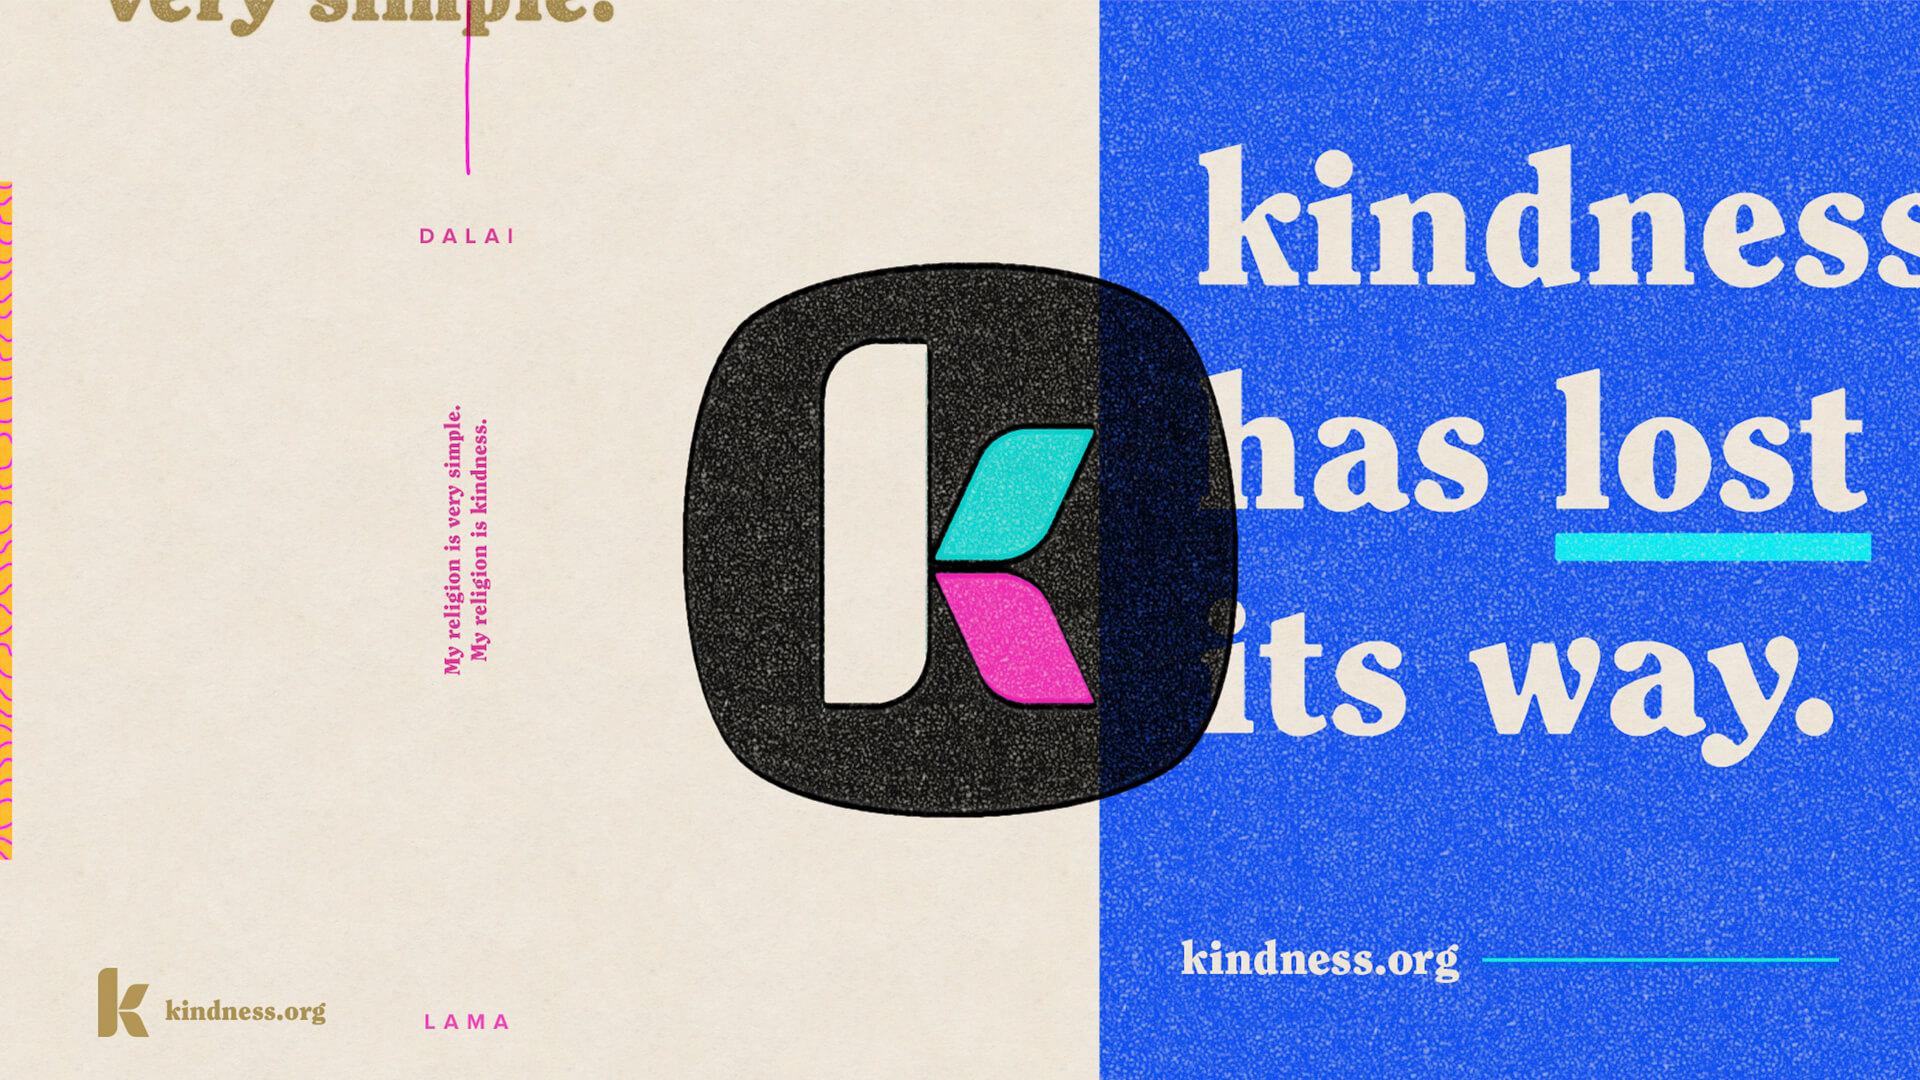 kindness.org